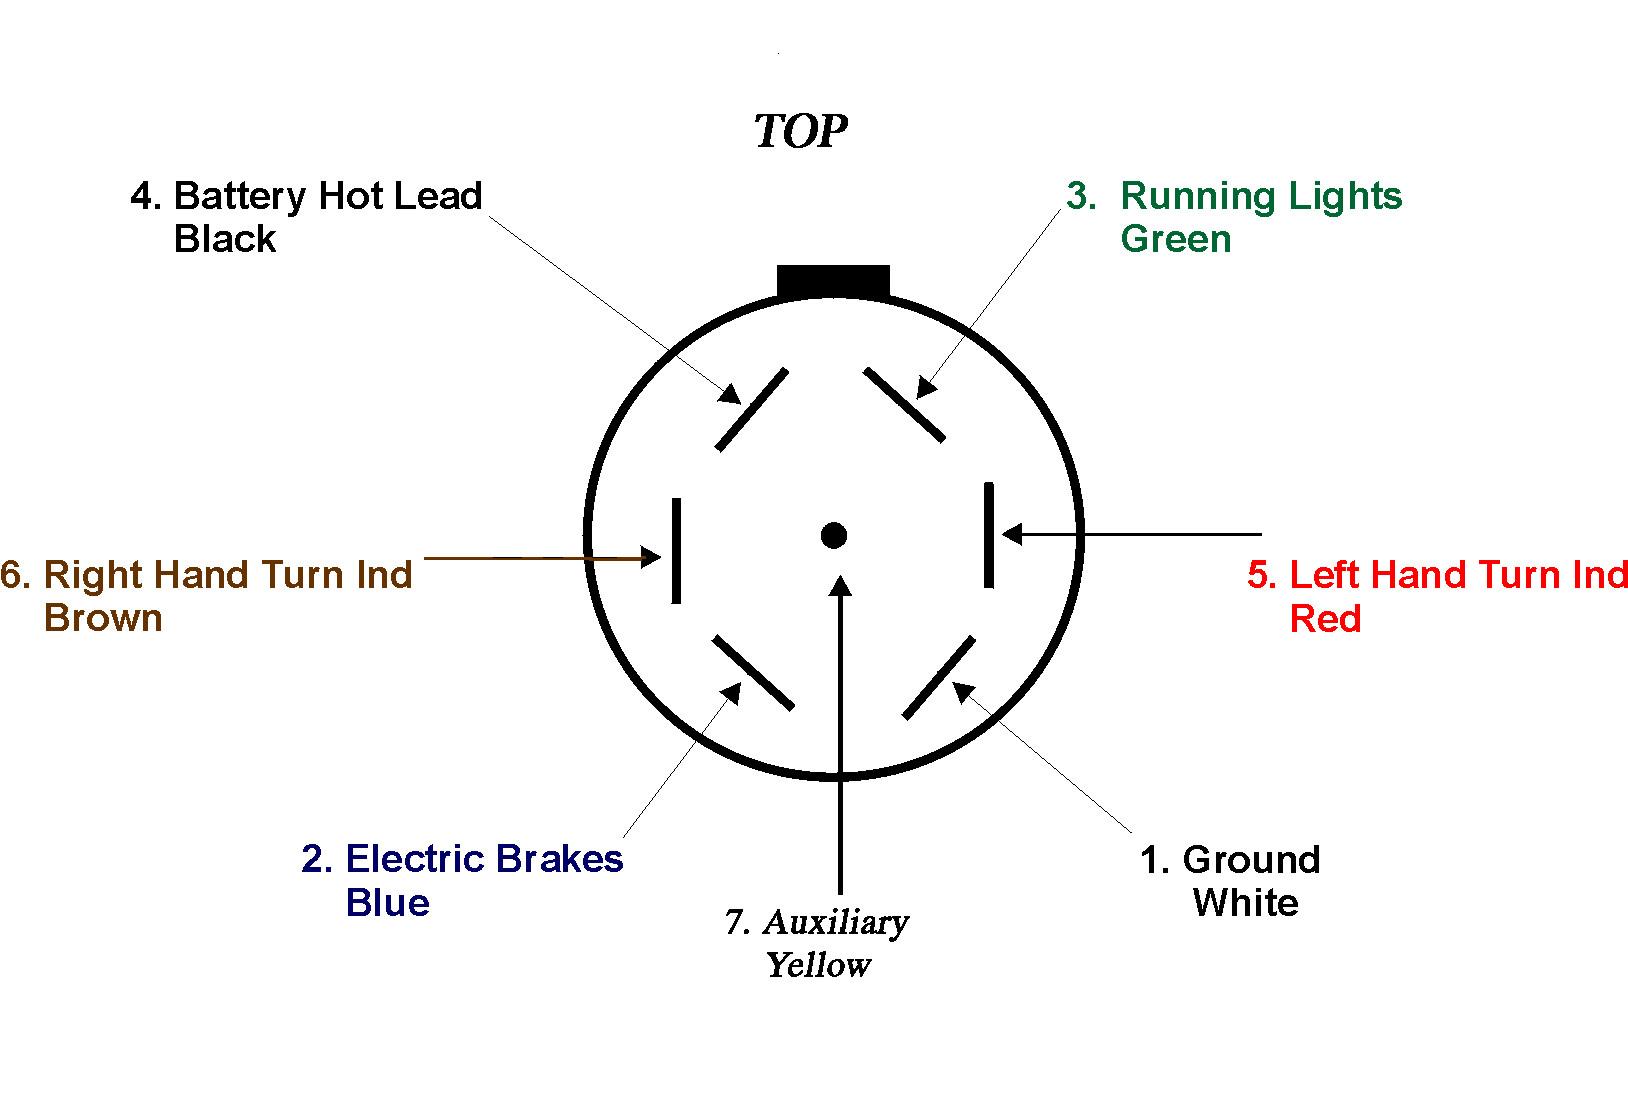 7 Pin Trailer Plug Wiring Diagram Luxury Seven Simple Standard - 7 Pin Trailer Connector Wiring Diagram